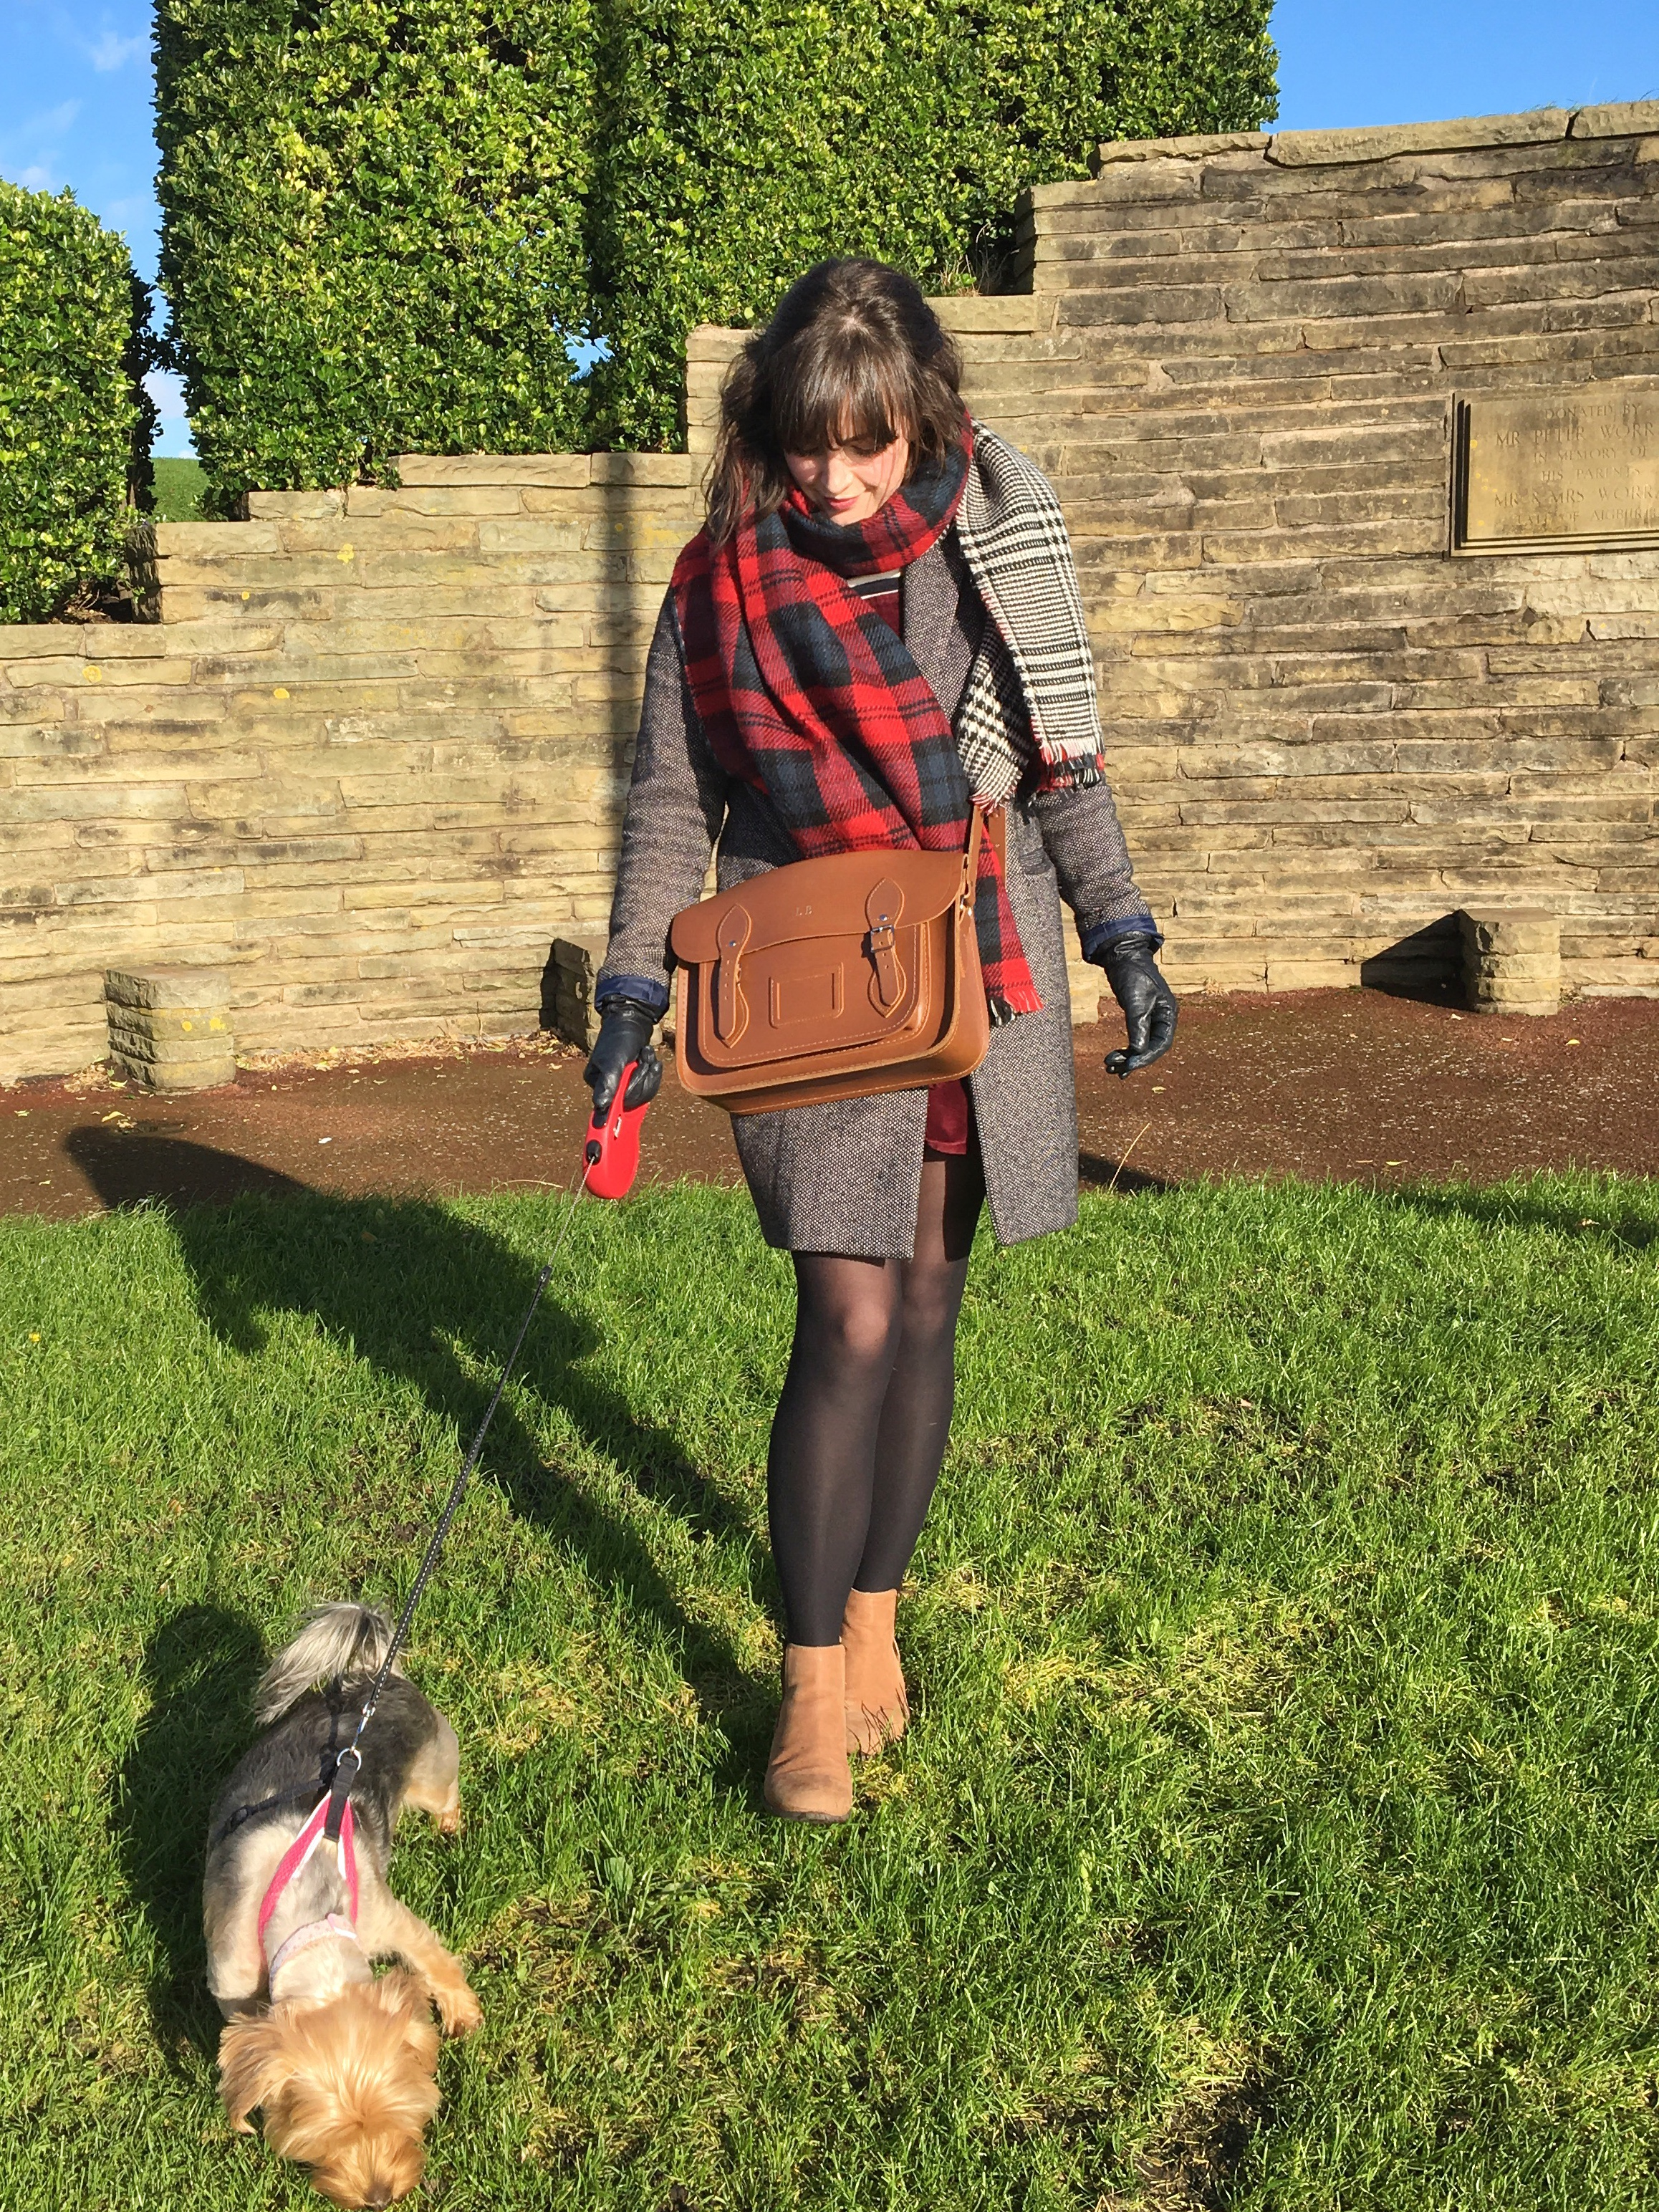 Tan leather Cambridge Satchel, with Cath Kidston tweed coat and Zara tartan scarf. Pinafores and Peonies blog